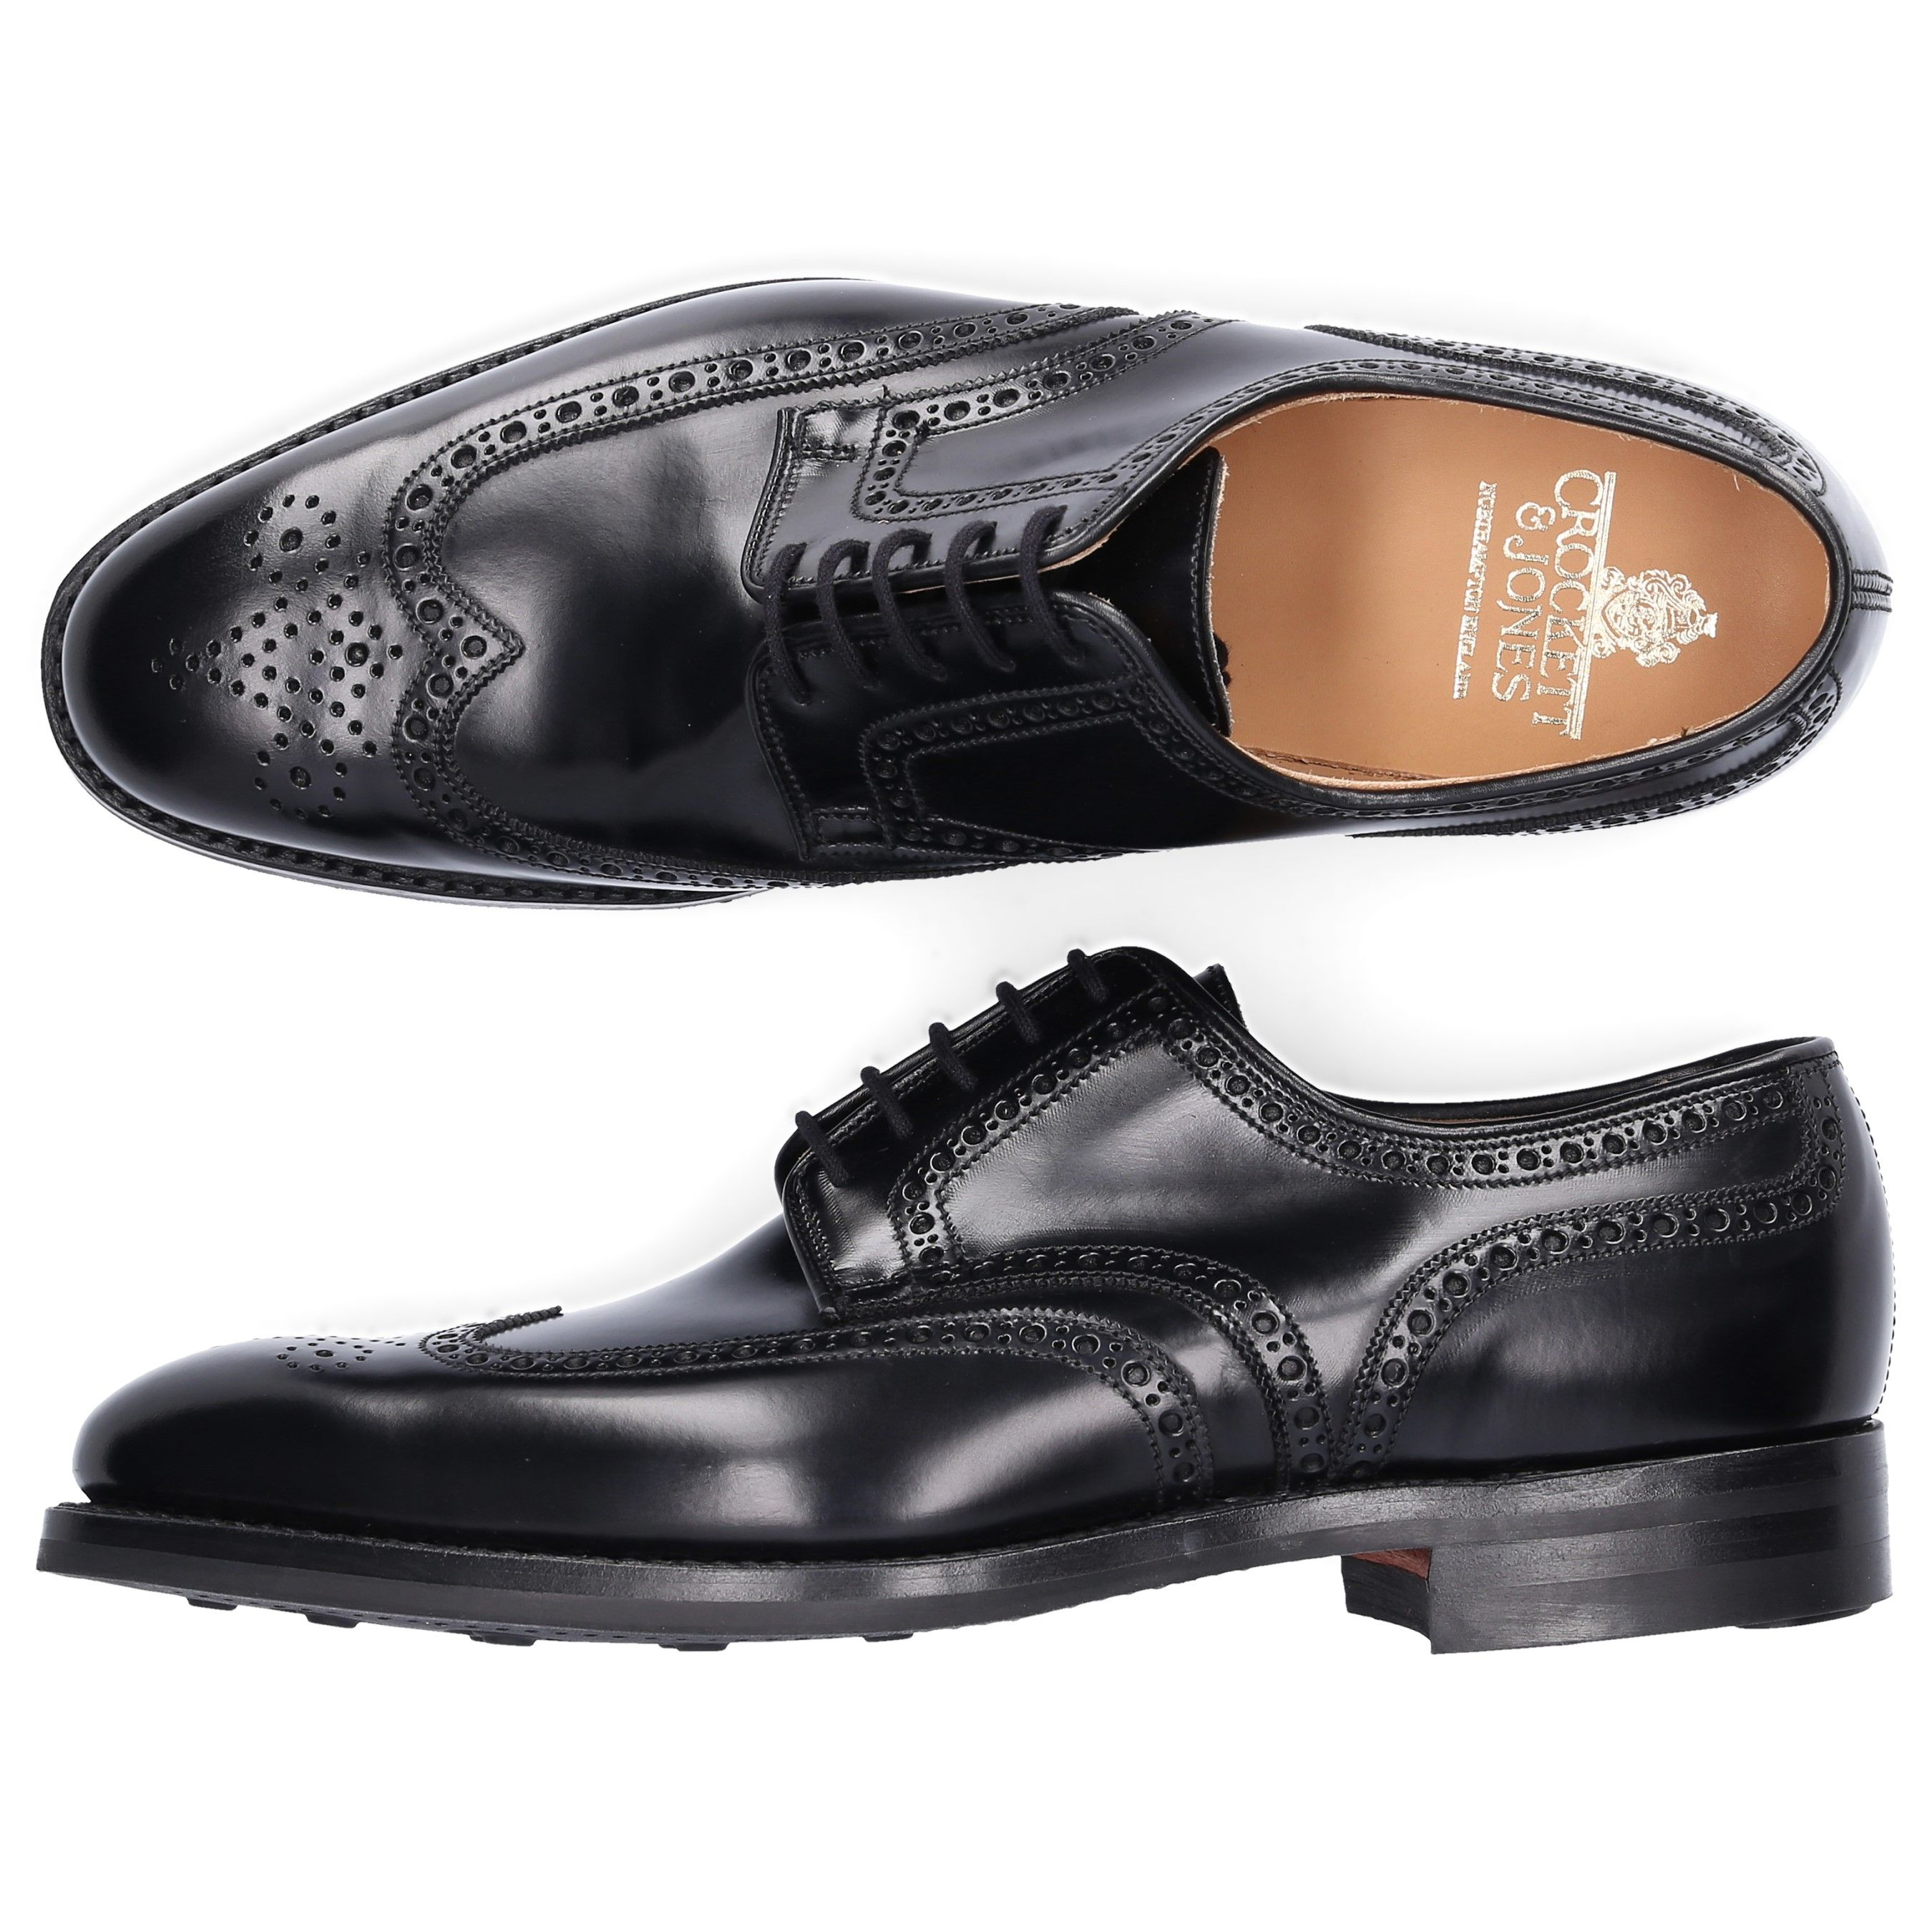 Crockett Jones Derby Trafford Calfskin Hole Pattern Black Crockettjones Shoes Mens Business Shoes Business Shoes Dress Shoes Men [ 2700 x 2700 Pixel ]